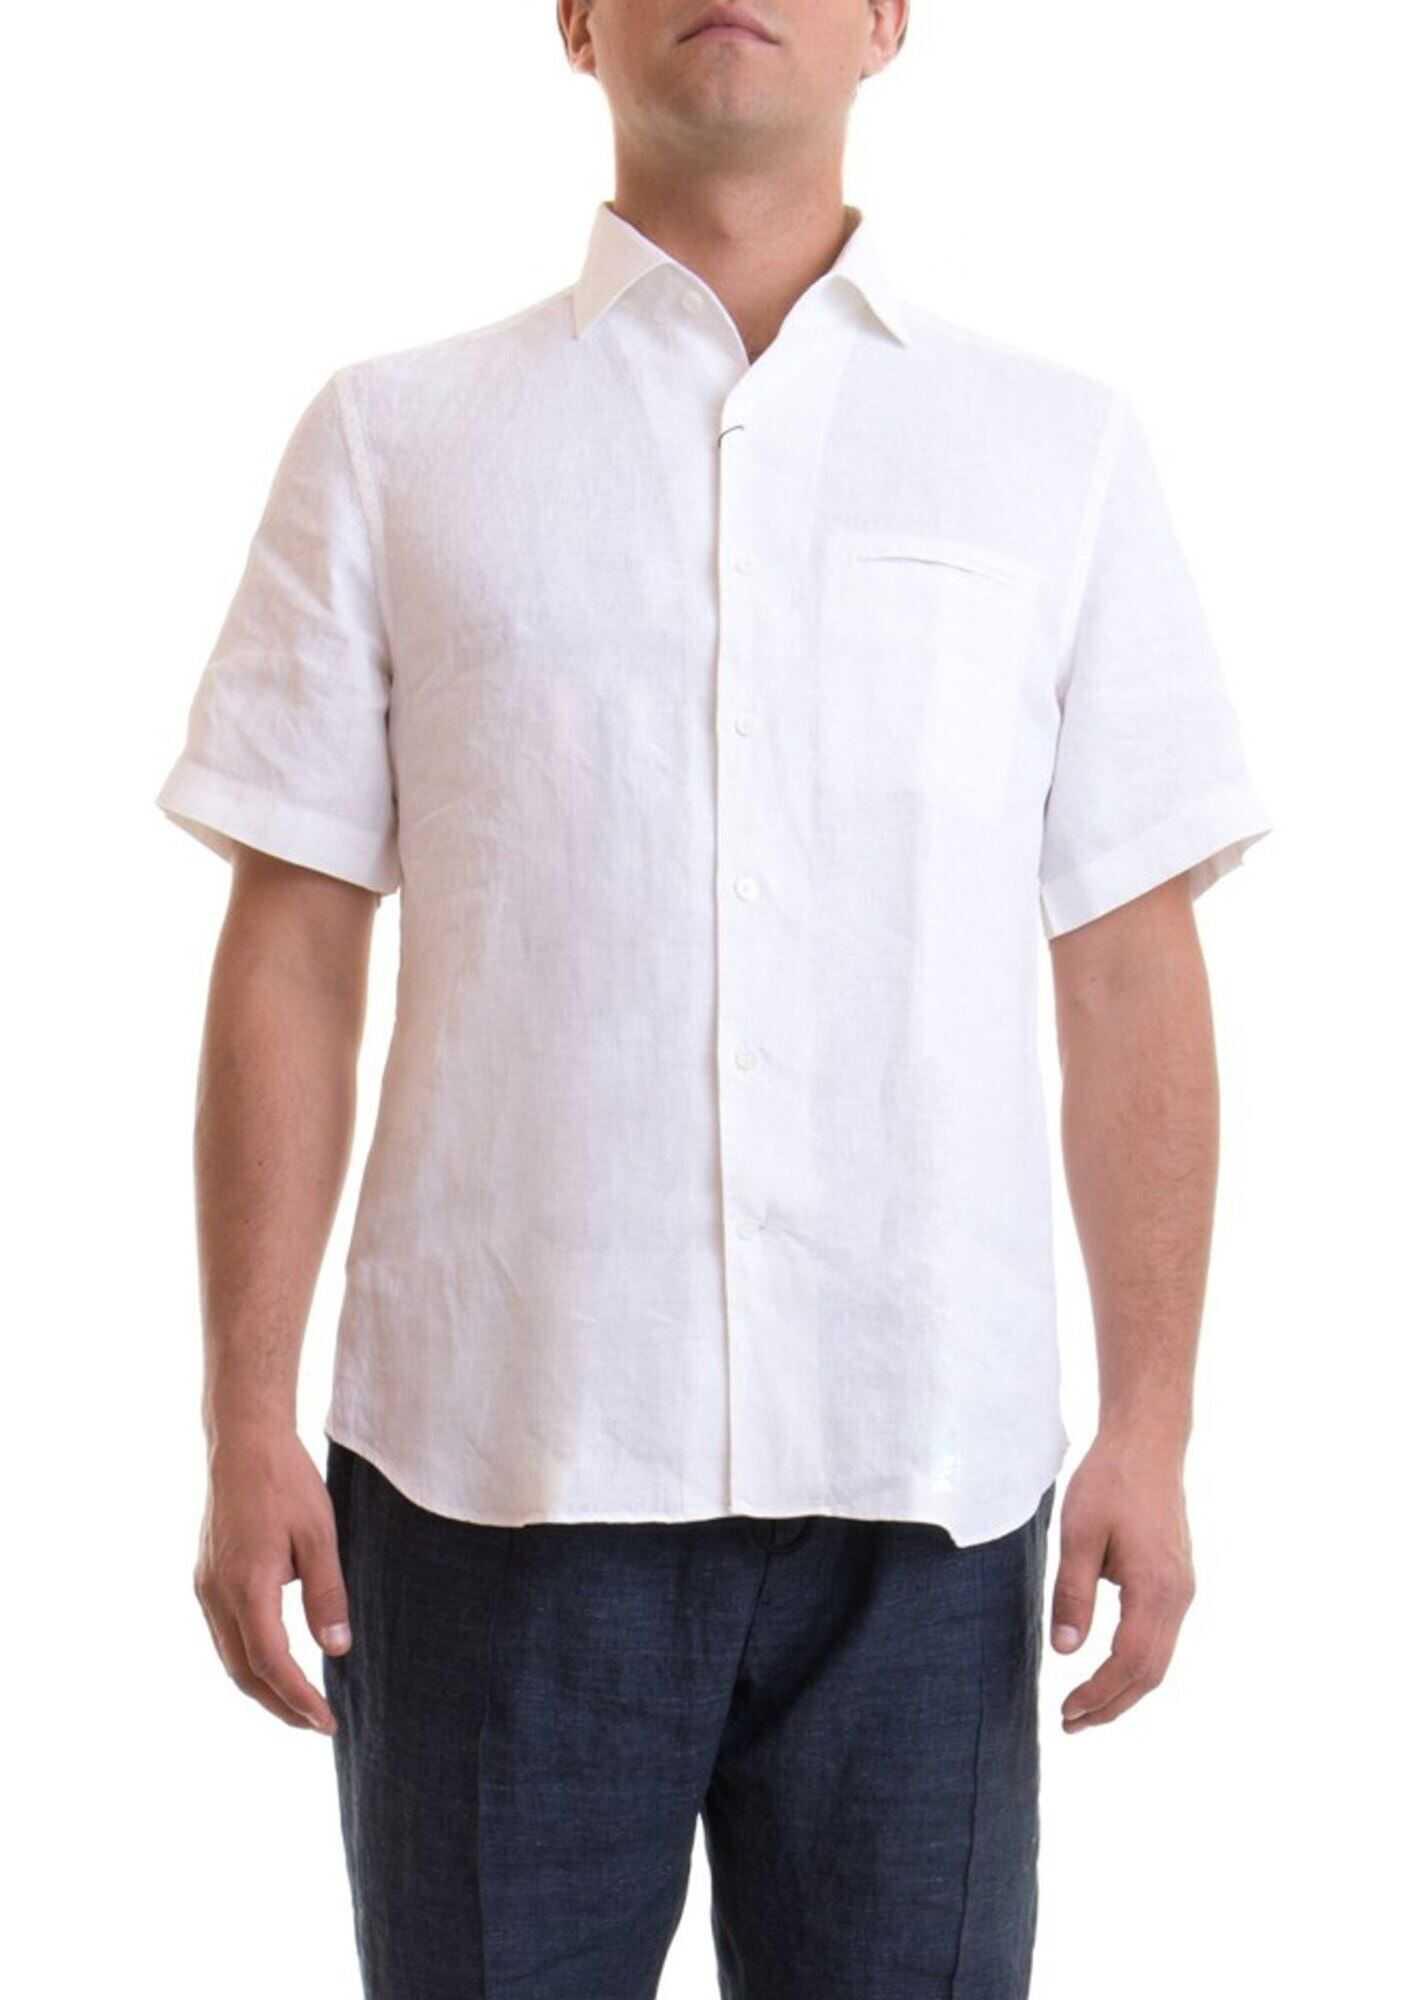 CORNELIANI Linen Short Sleeve Shirt In White White imagine